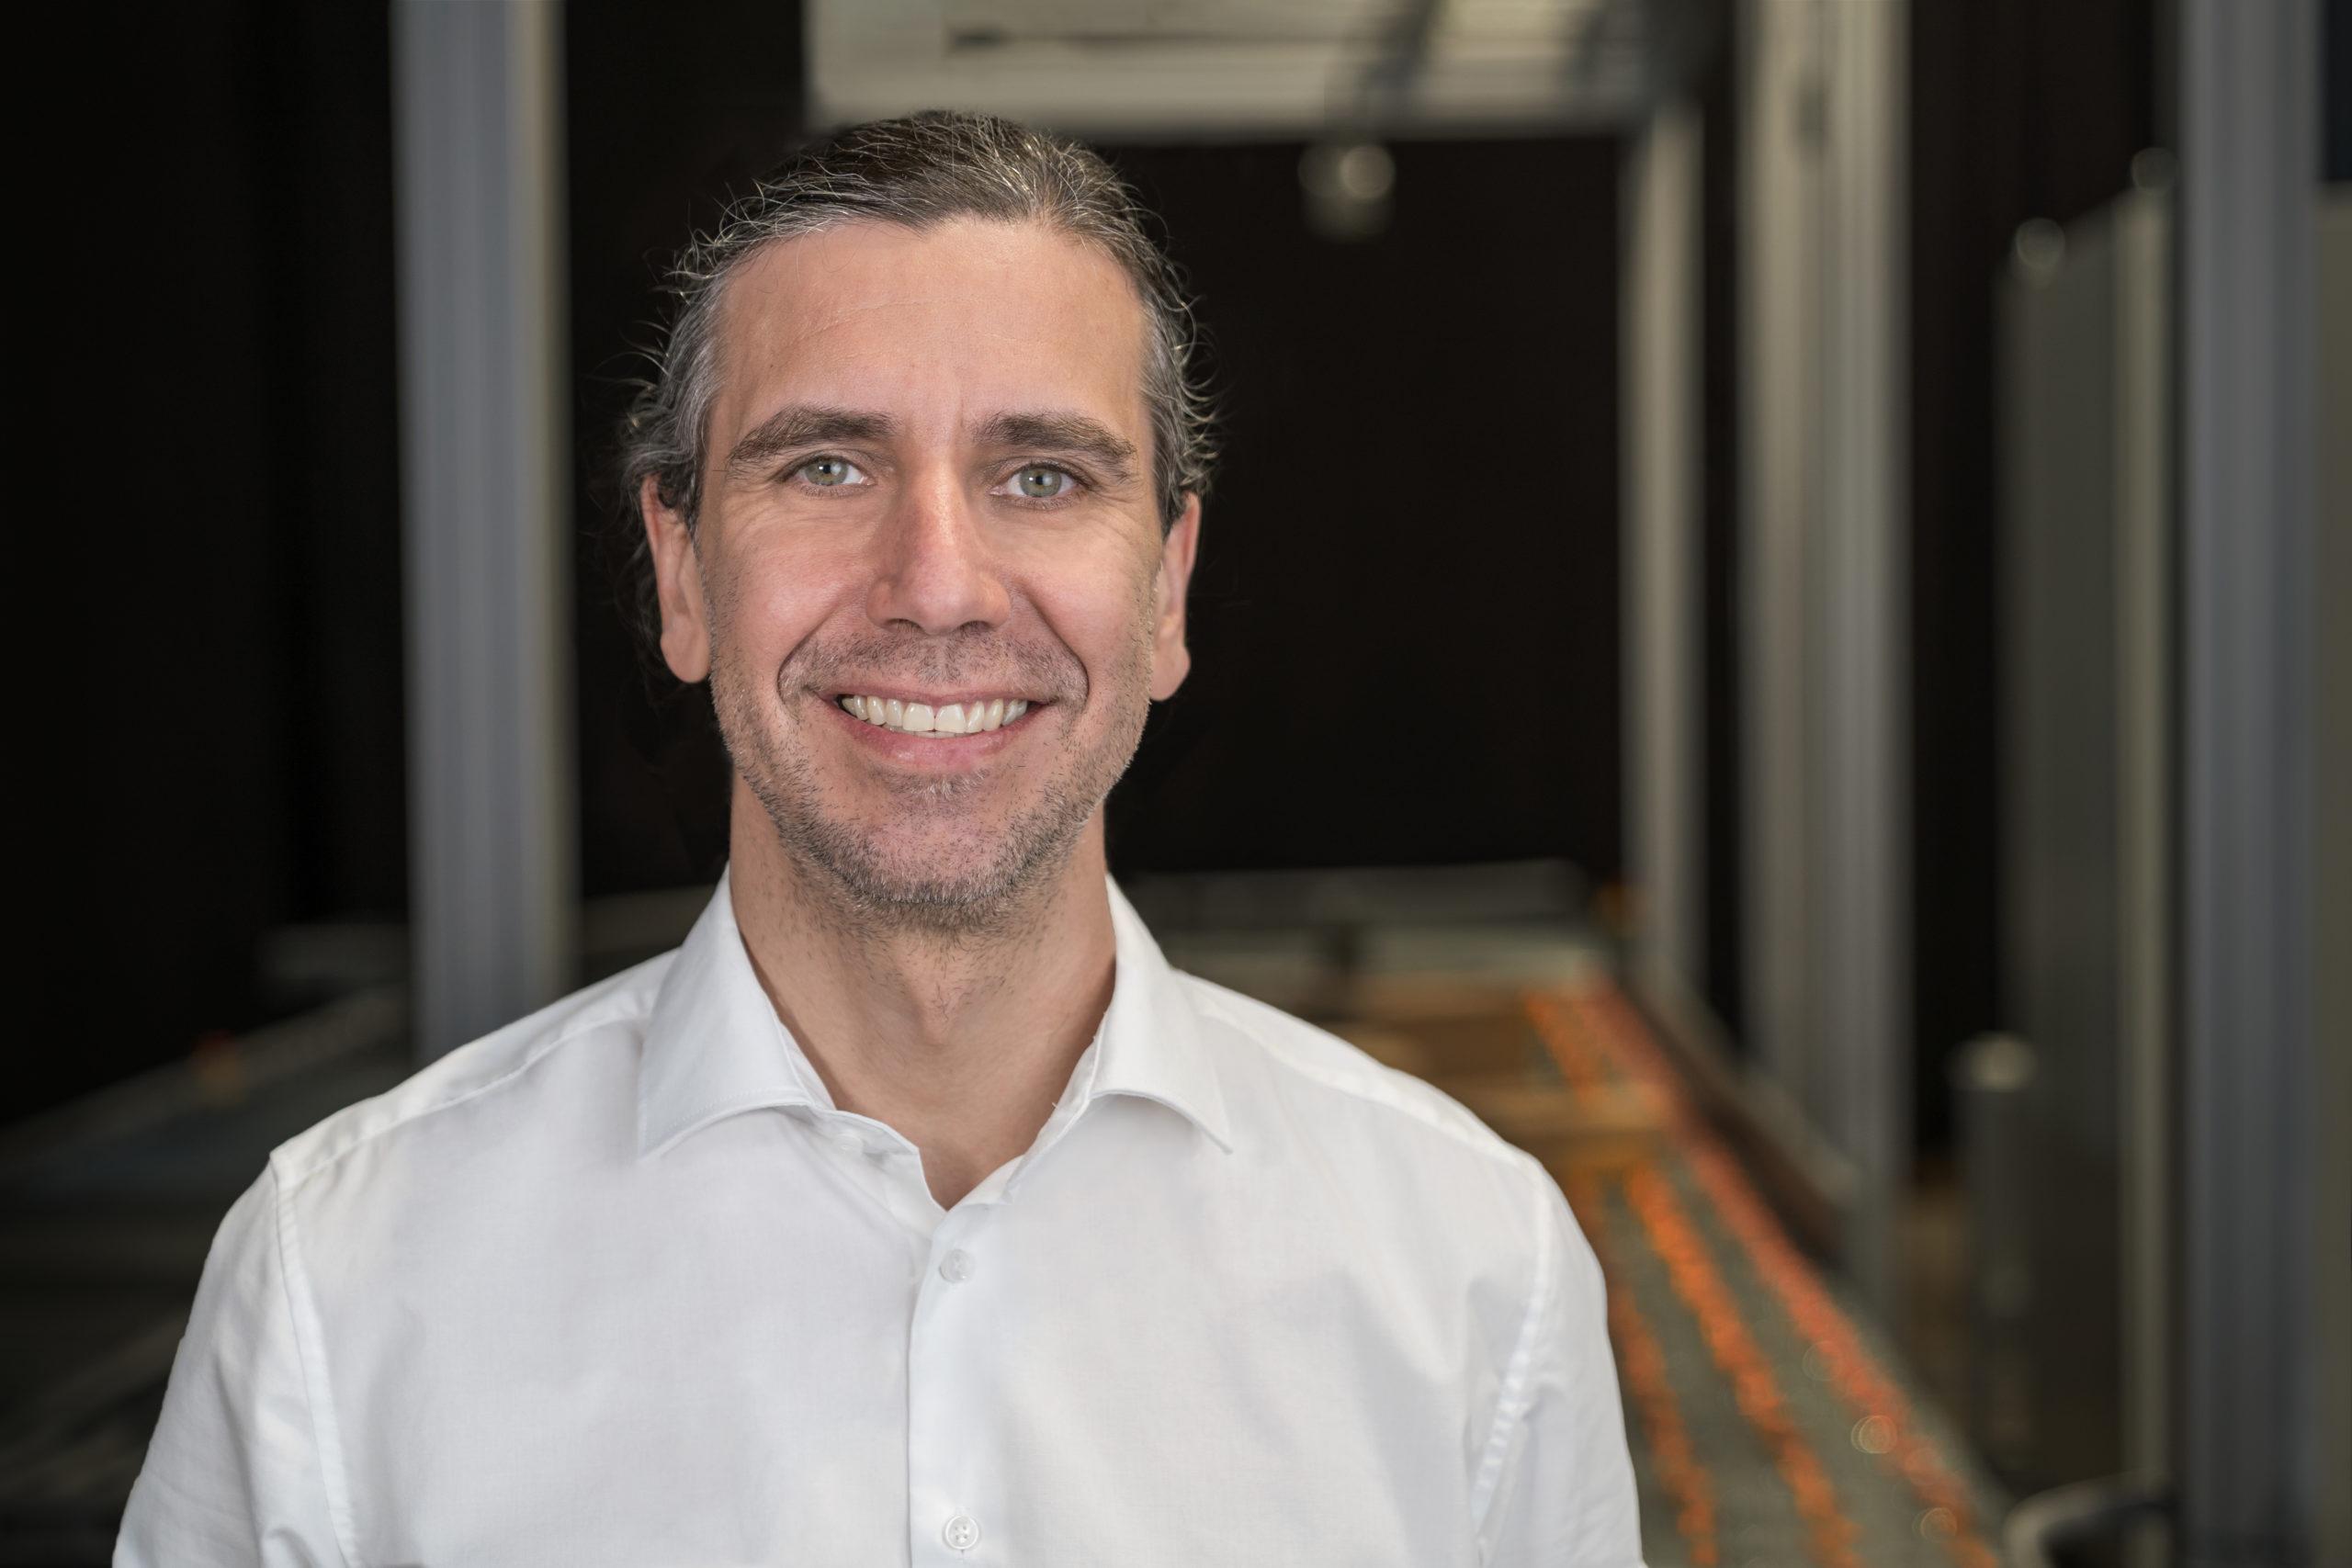 Claudio Uriarte CTO Founder bei cellumation